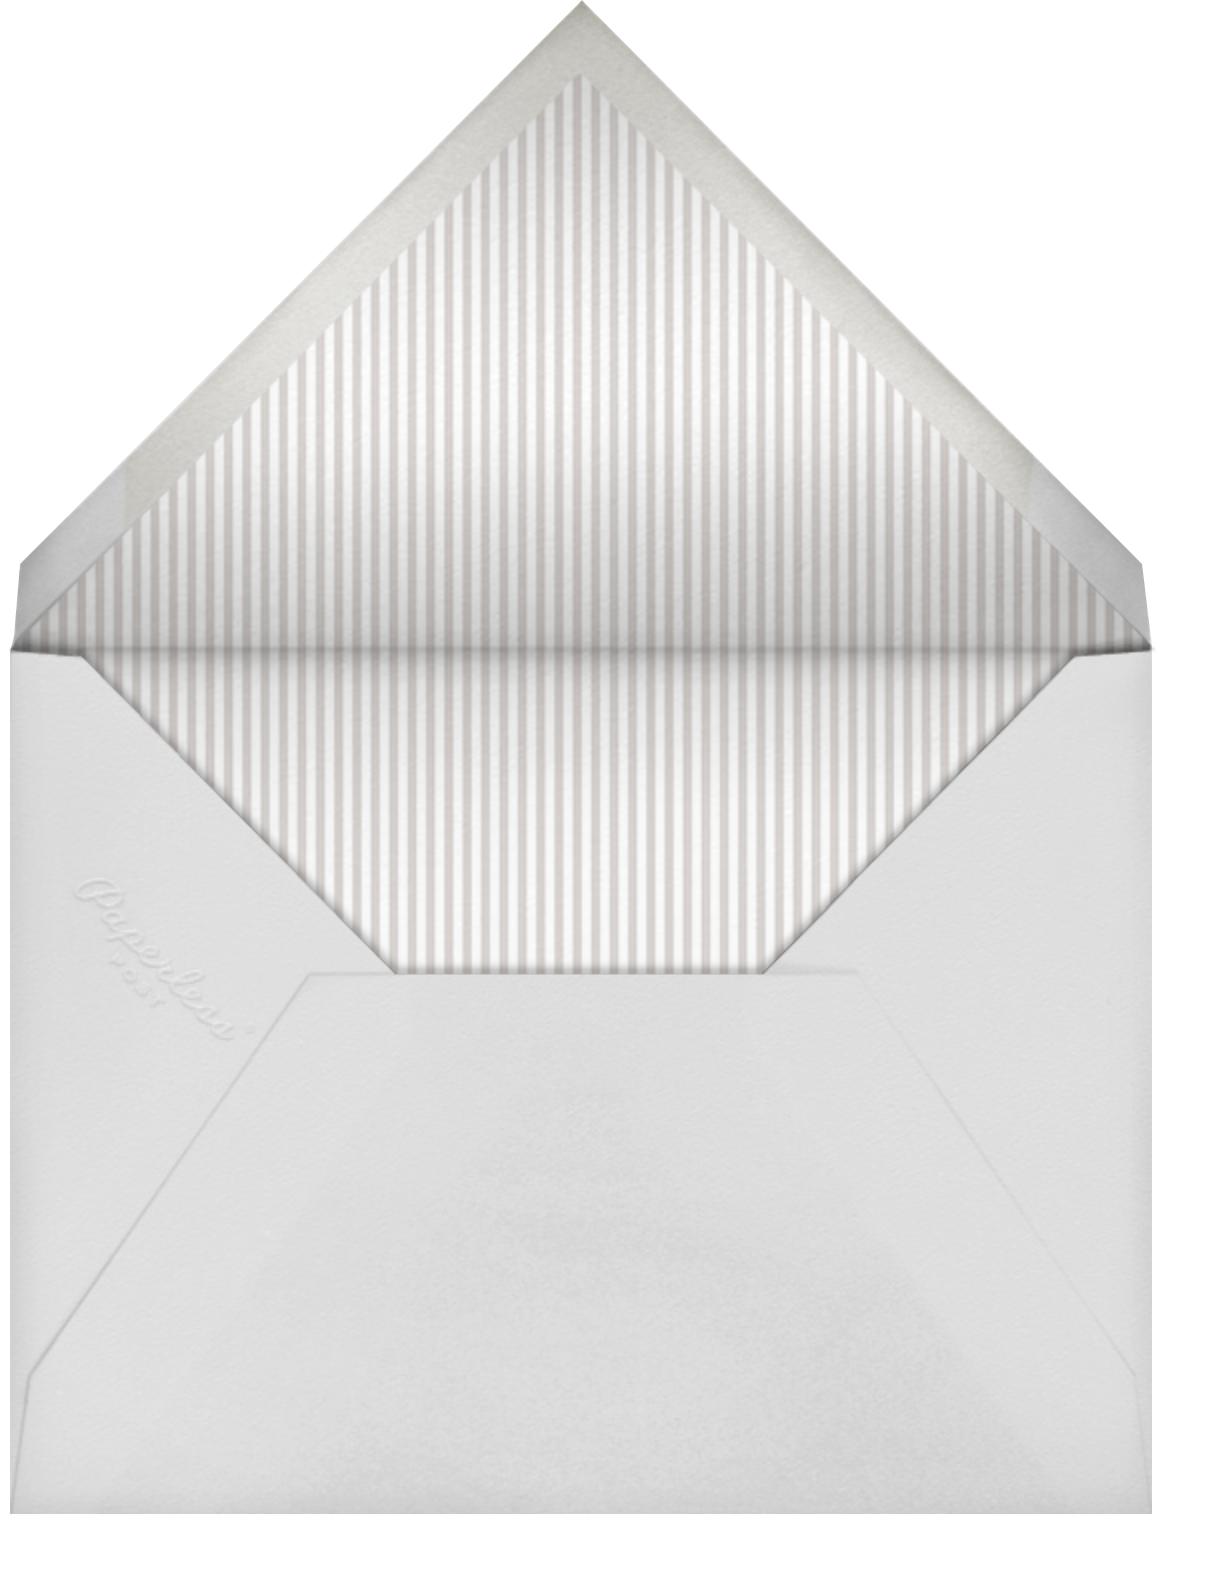 Marrakesh - Orange (Square) - Paperless Post - Adult birthday - envelope back